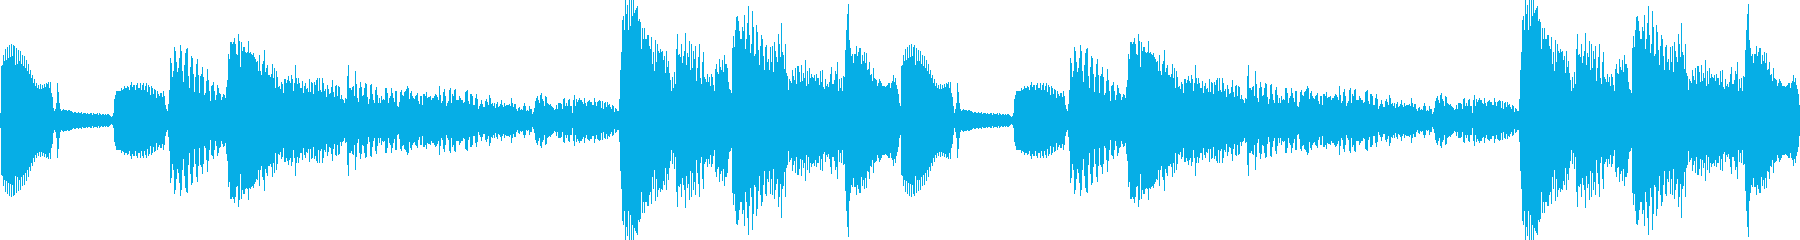 k013 アラーム音(ループ仕様)の再生済みの波形